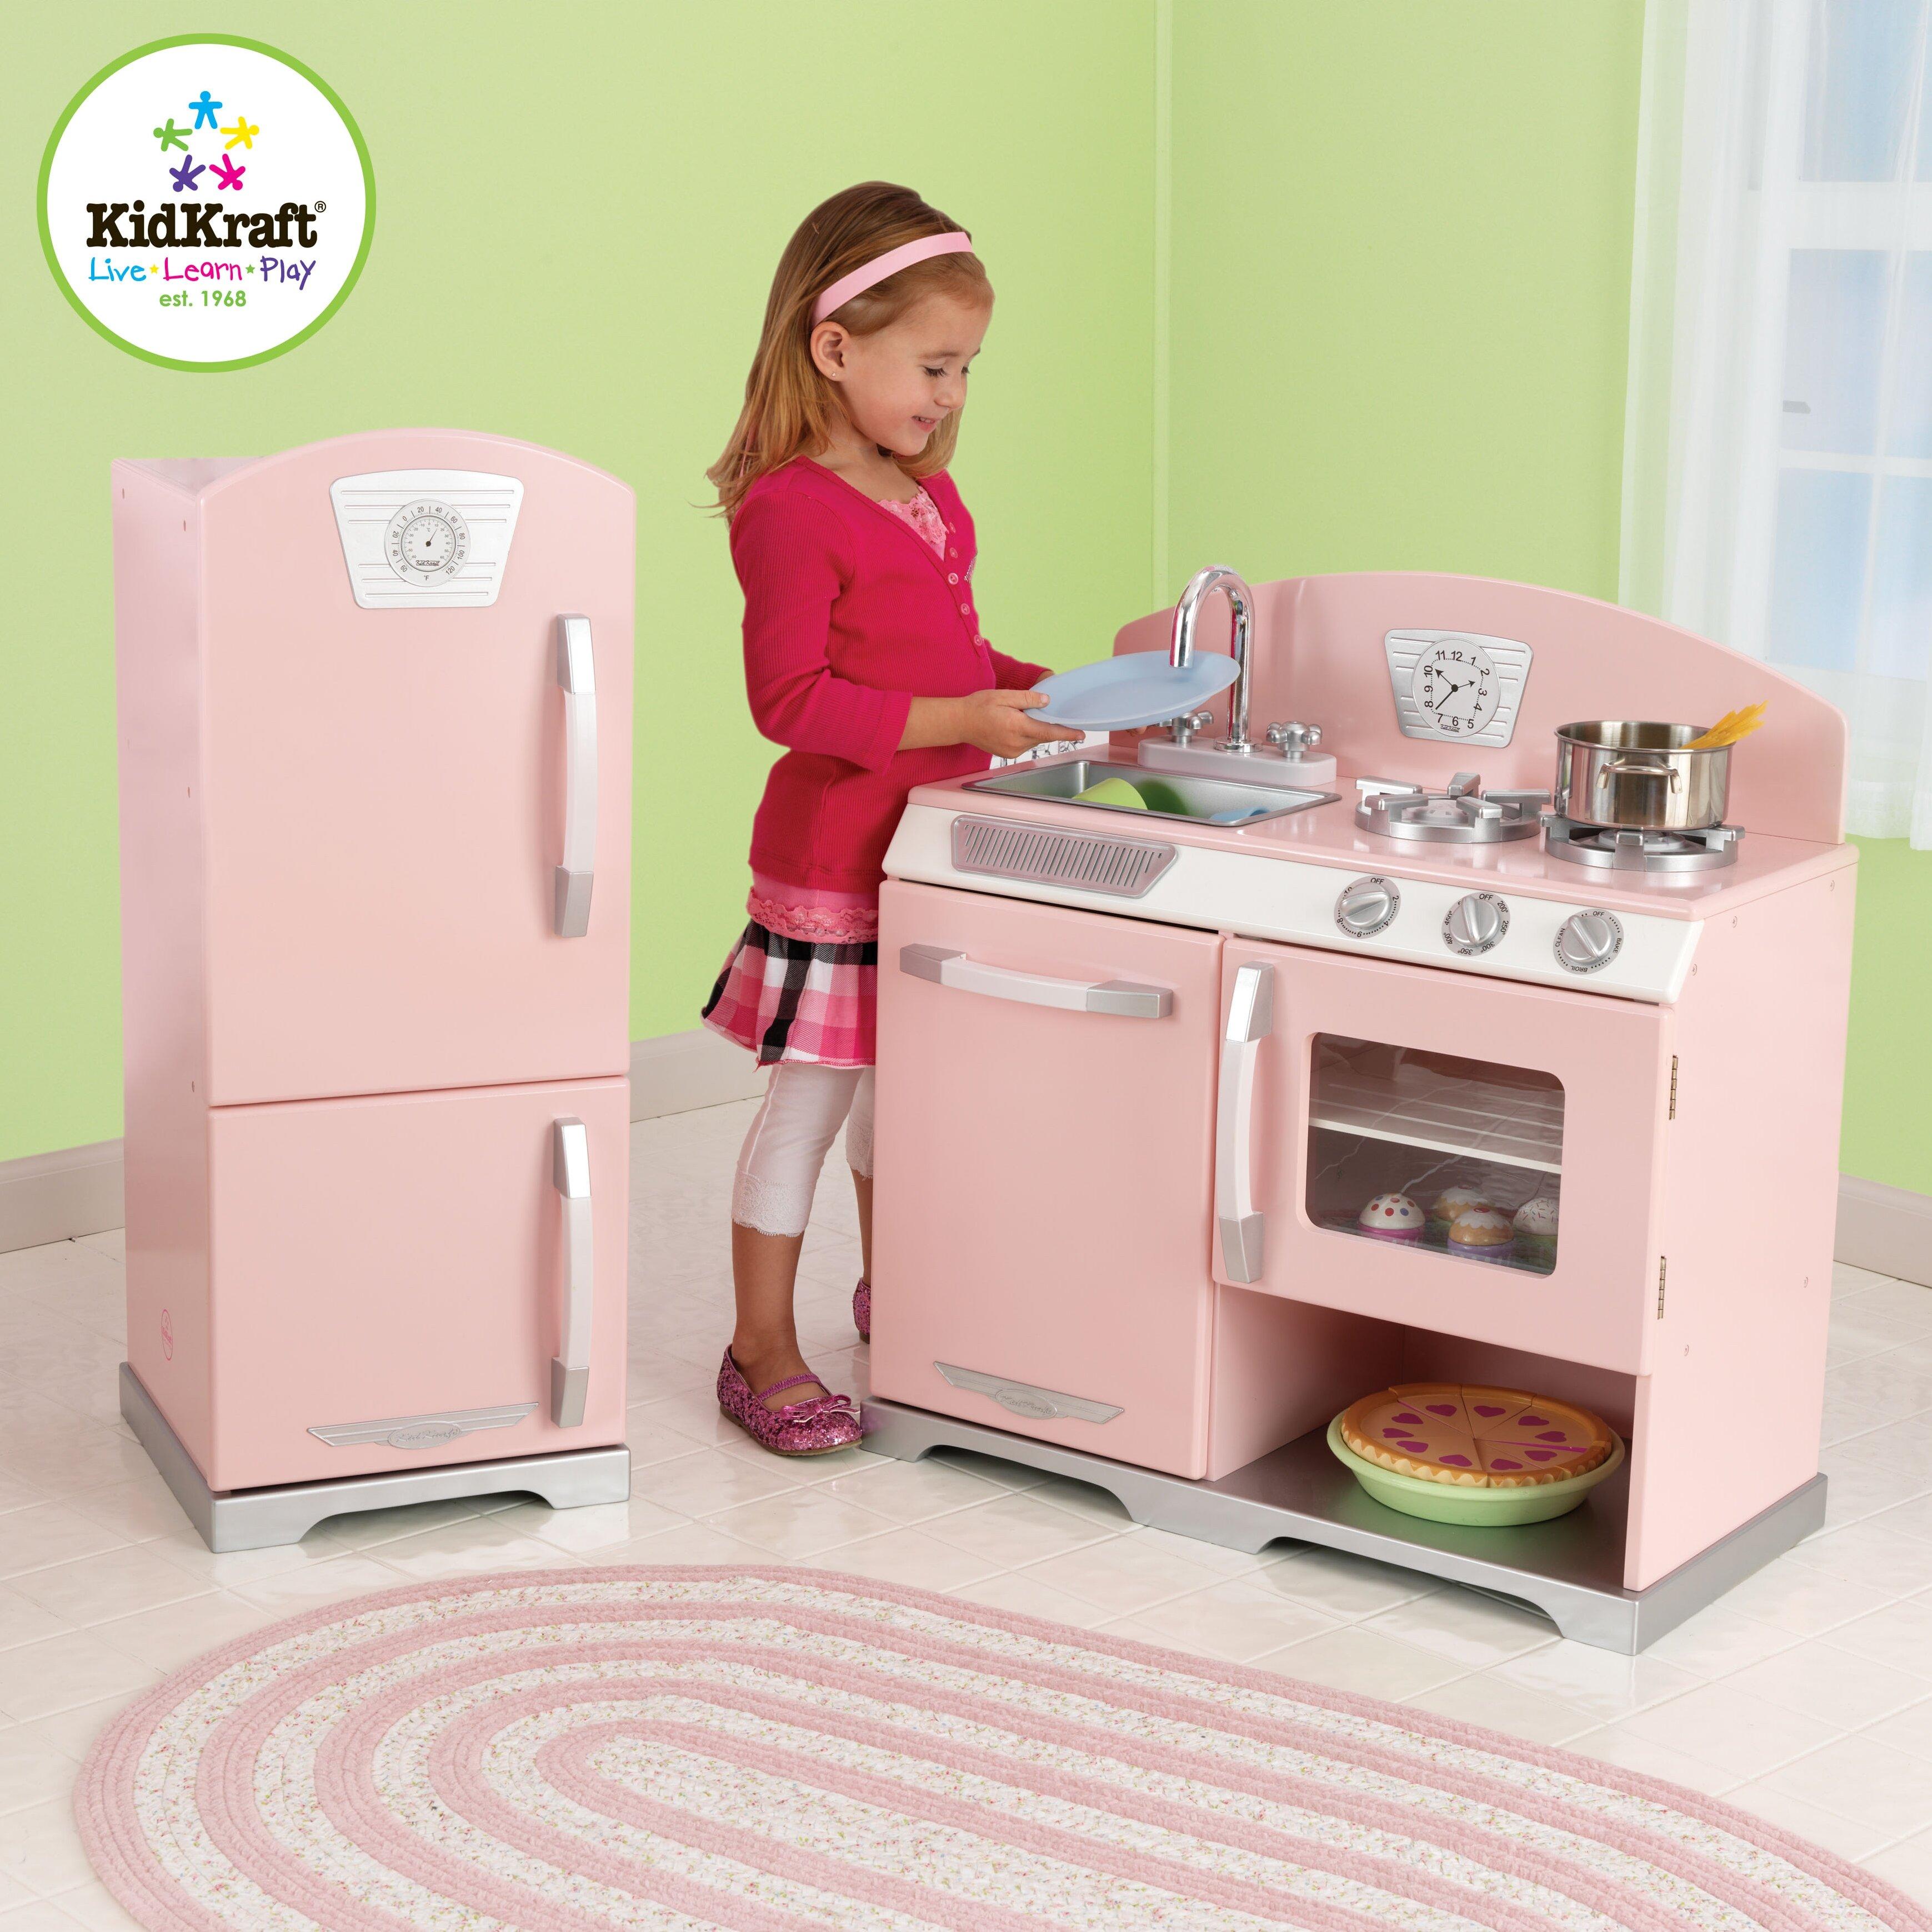 Retro Kitchen Small Appliances Kidkraft 2 Piece Retro Kitchen And Refrigerator Set Reviews